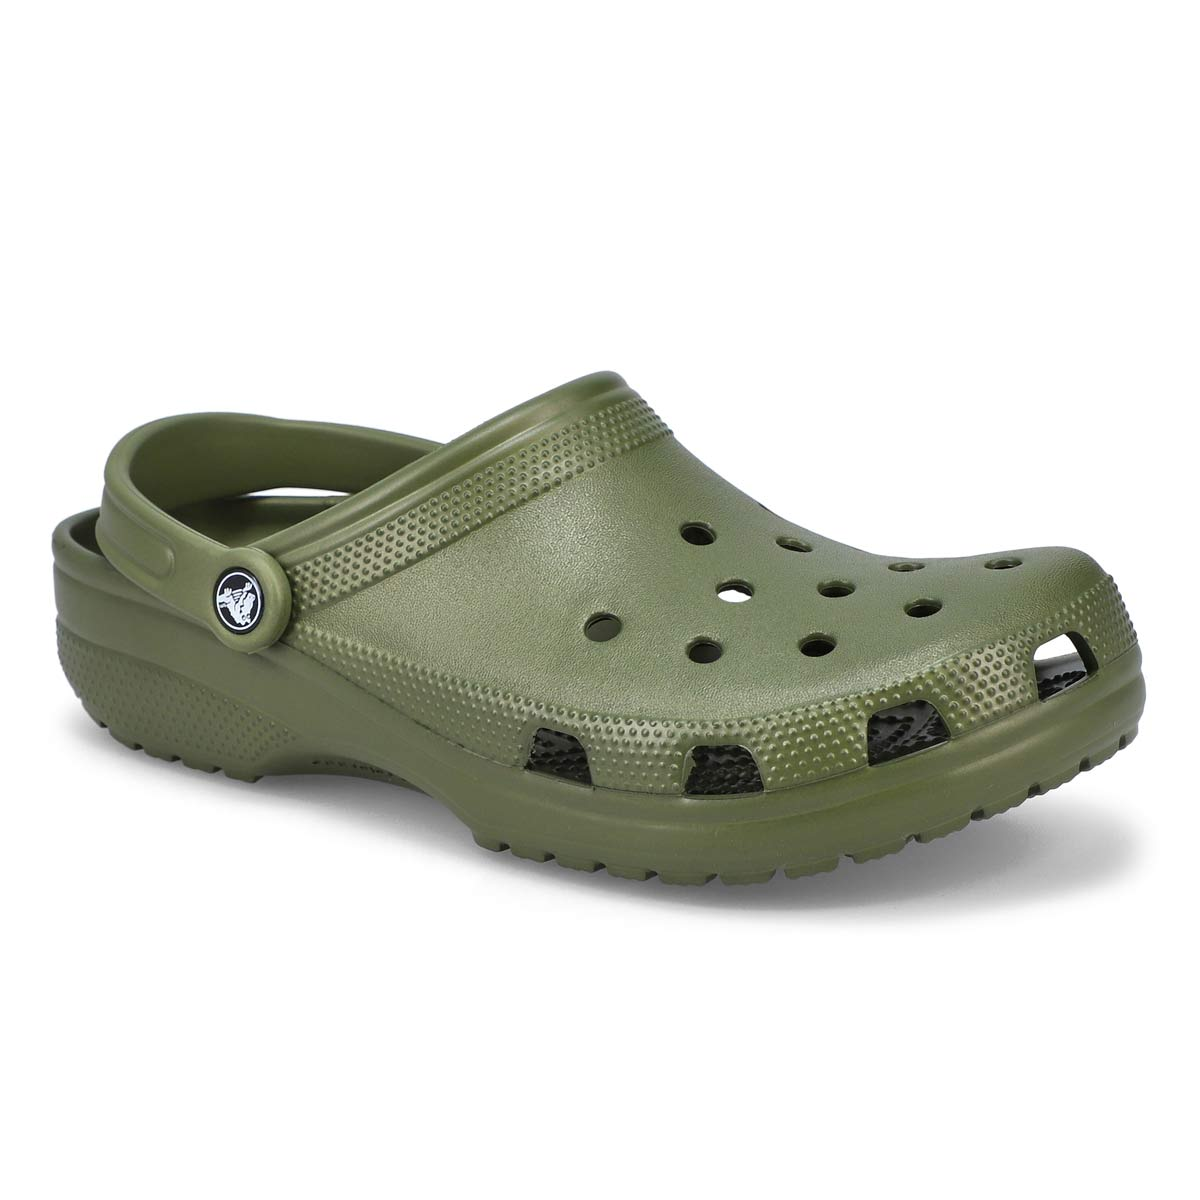 Men's Classic EVA Clog - Army Green